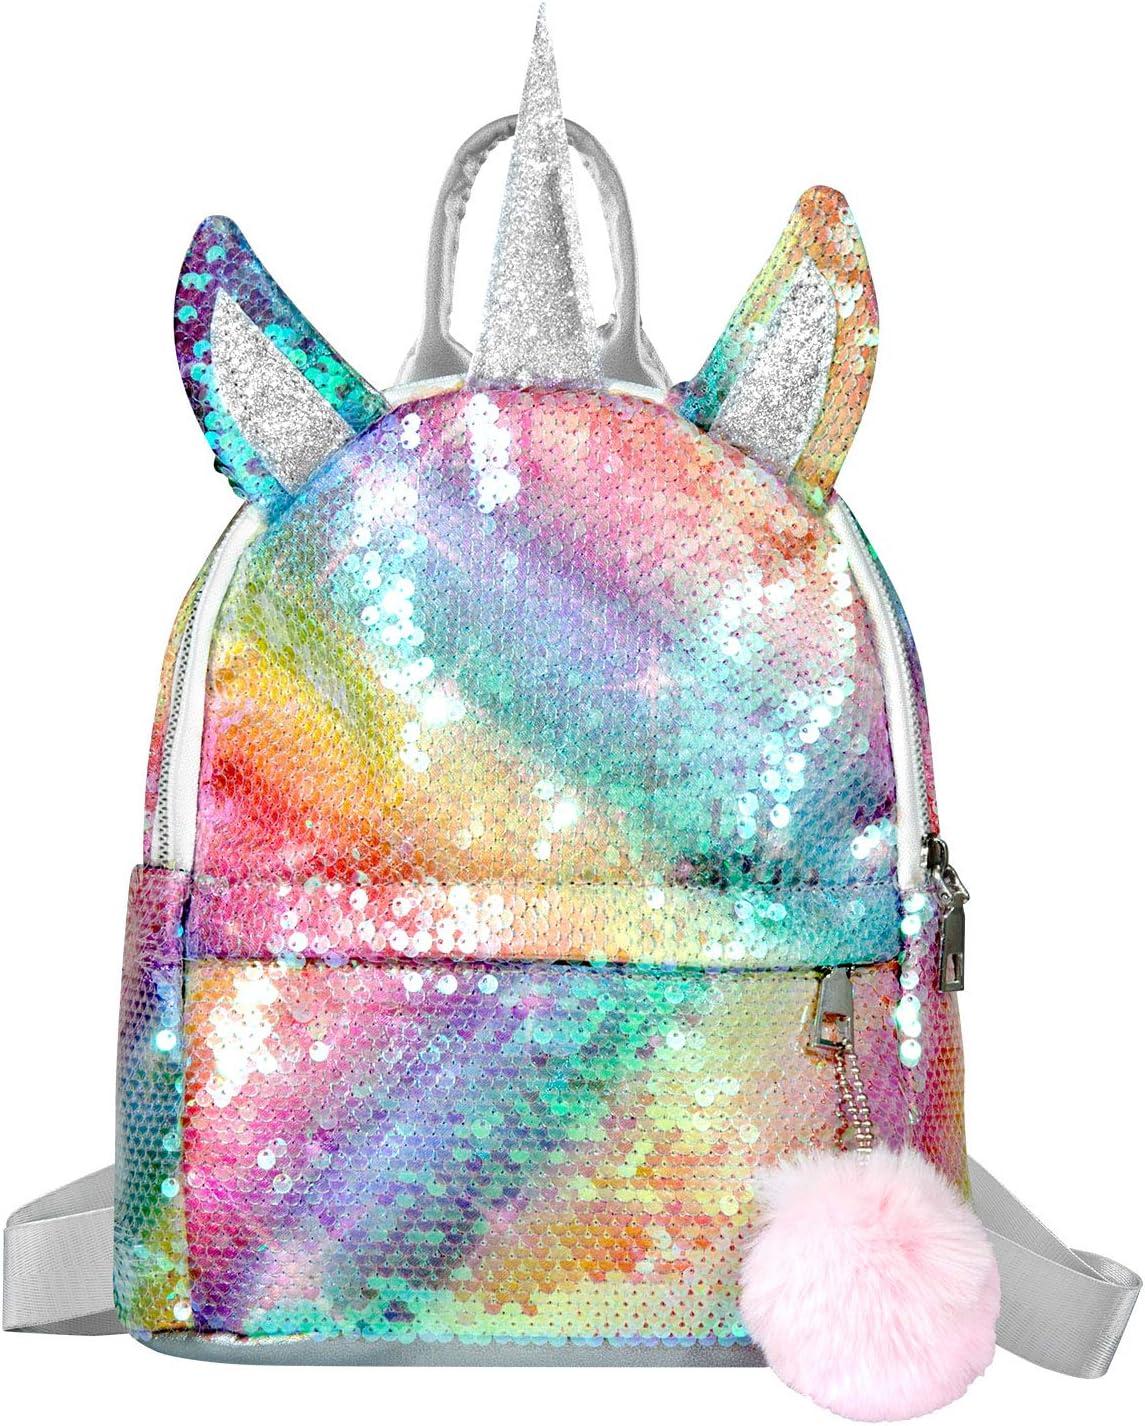 WolinTek Mochila de Unicornio, Mochila Escolar para niña, Mochila de Lentejuelas, Mochila de Viaje,Mochila de Moda Cute Glitter Girl